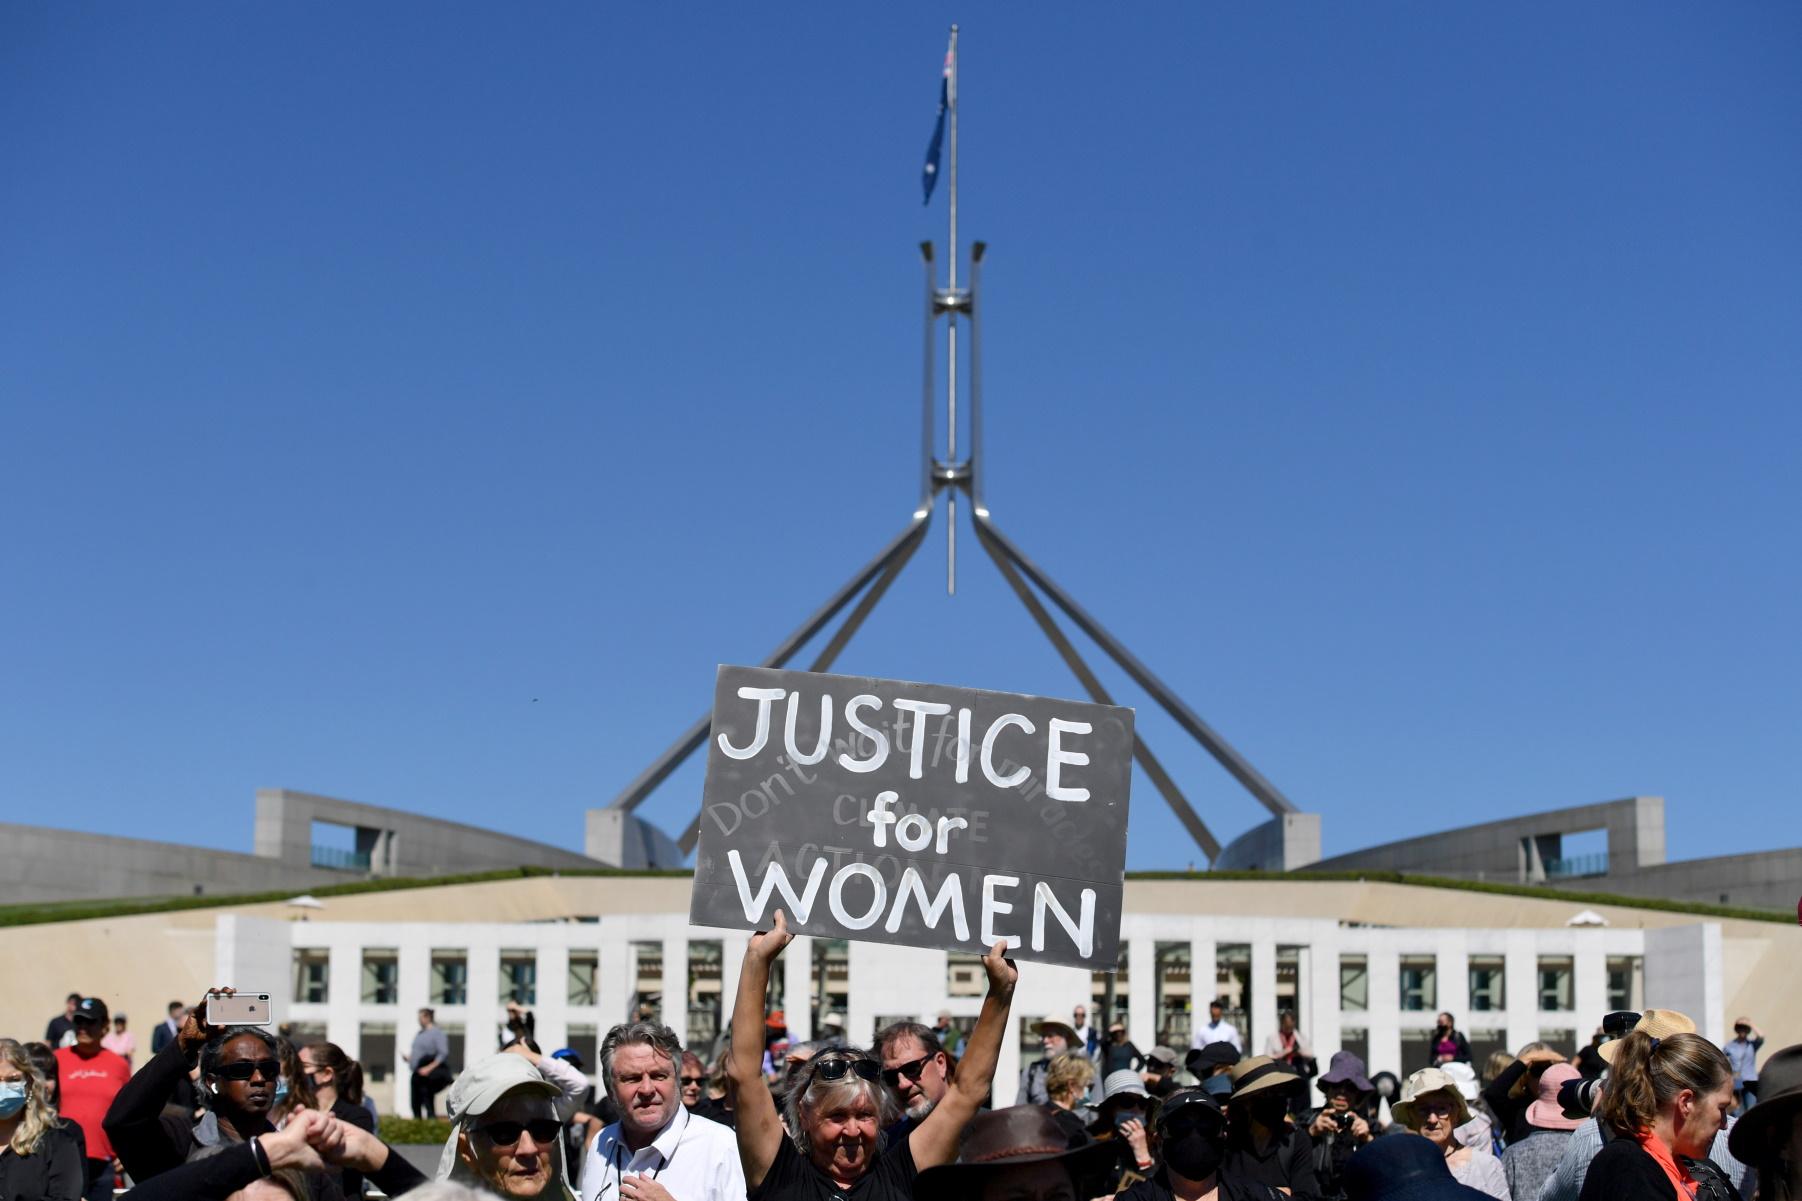 AUSTRALIA POLITICS RAPE 2 REUTERS 23 03 2021